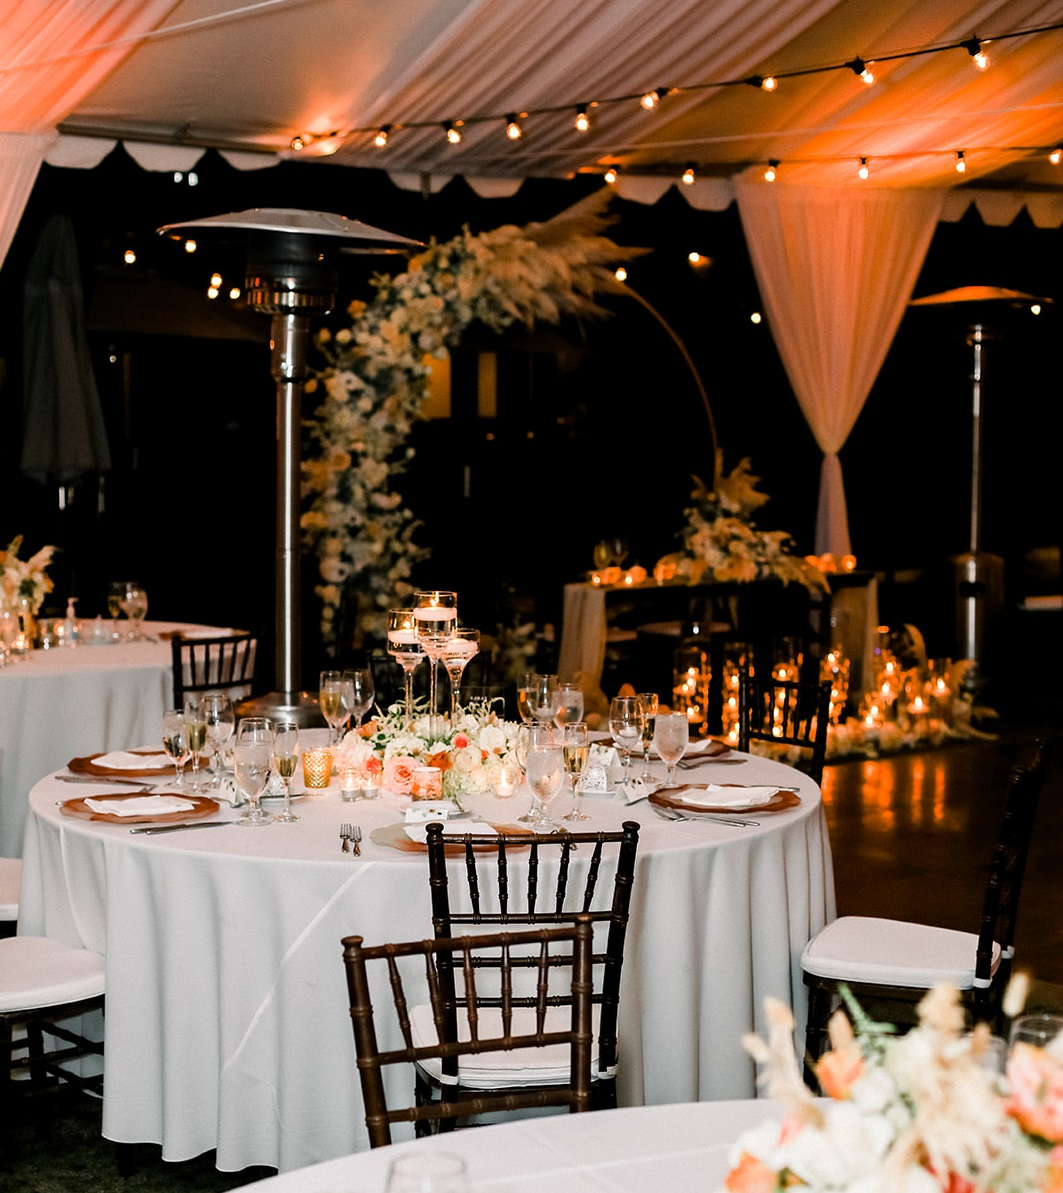 Arroyo Trabuco Golf Club weddings